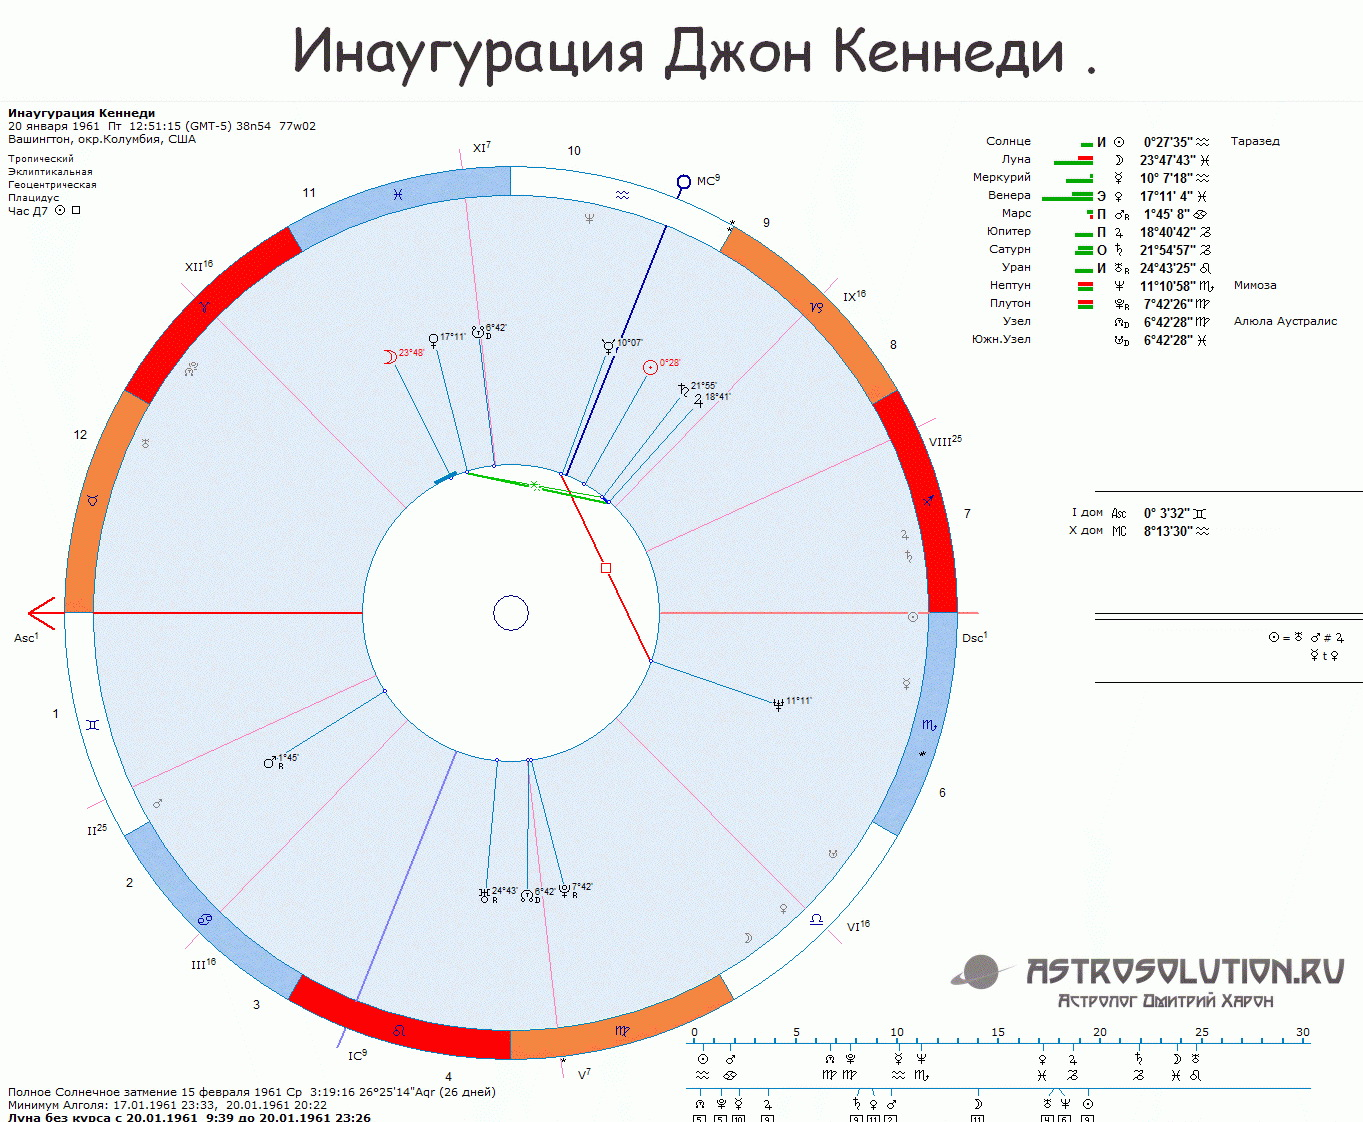 Инаугурация Джон Кеннеди астрология